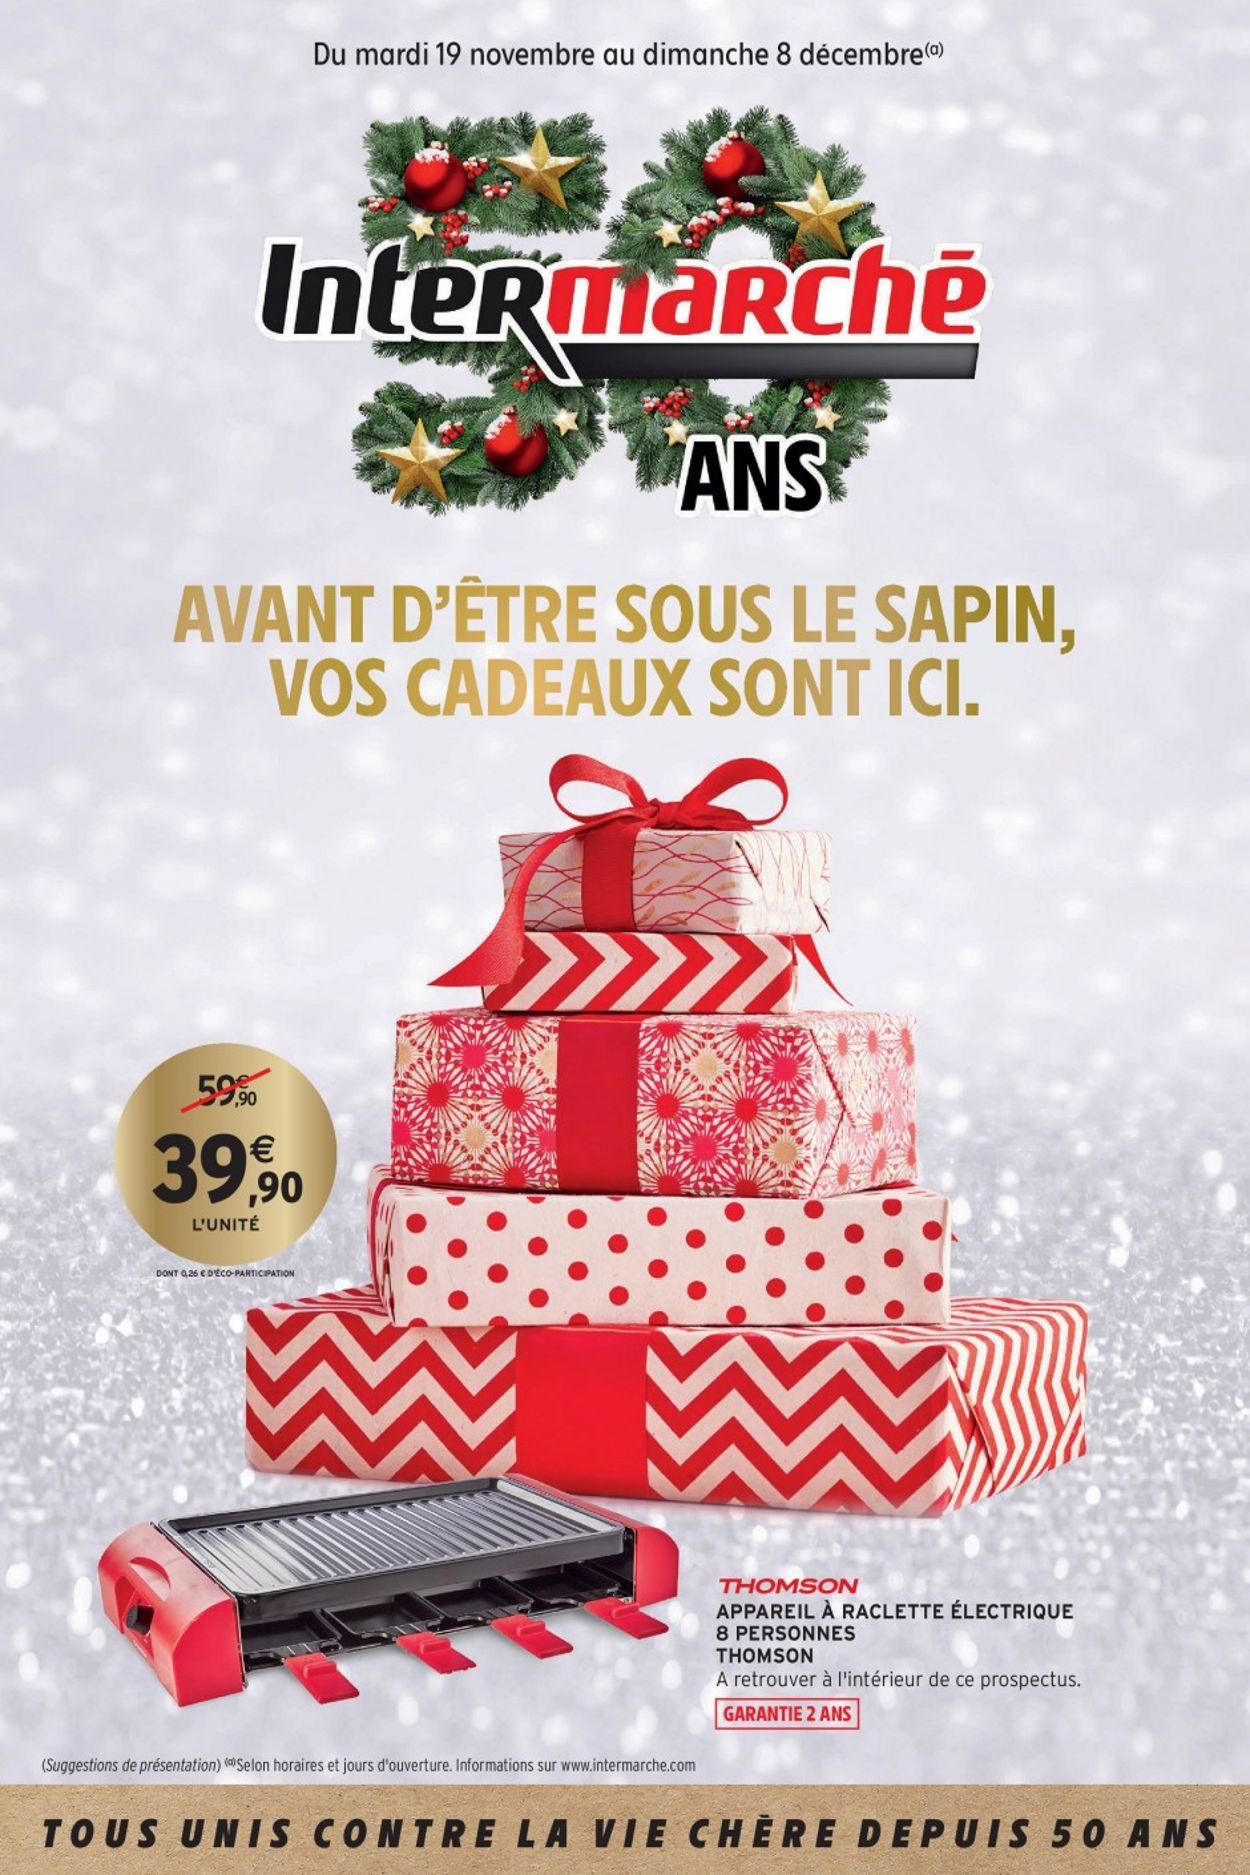 Intermarché catalogue de Noël 2019 Catalogue - 19.11-08.12.2019